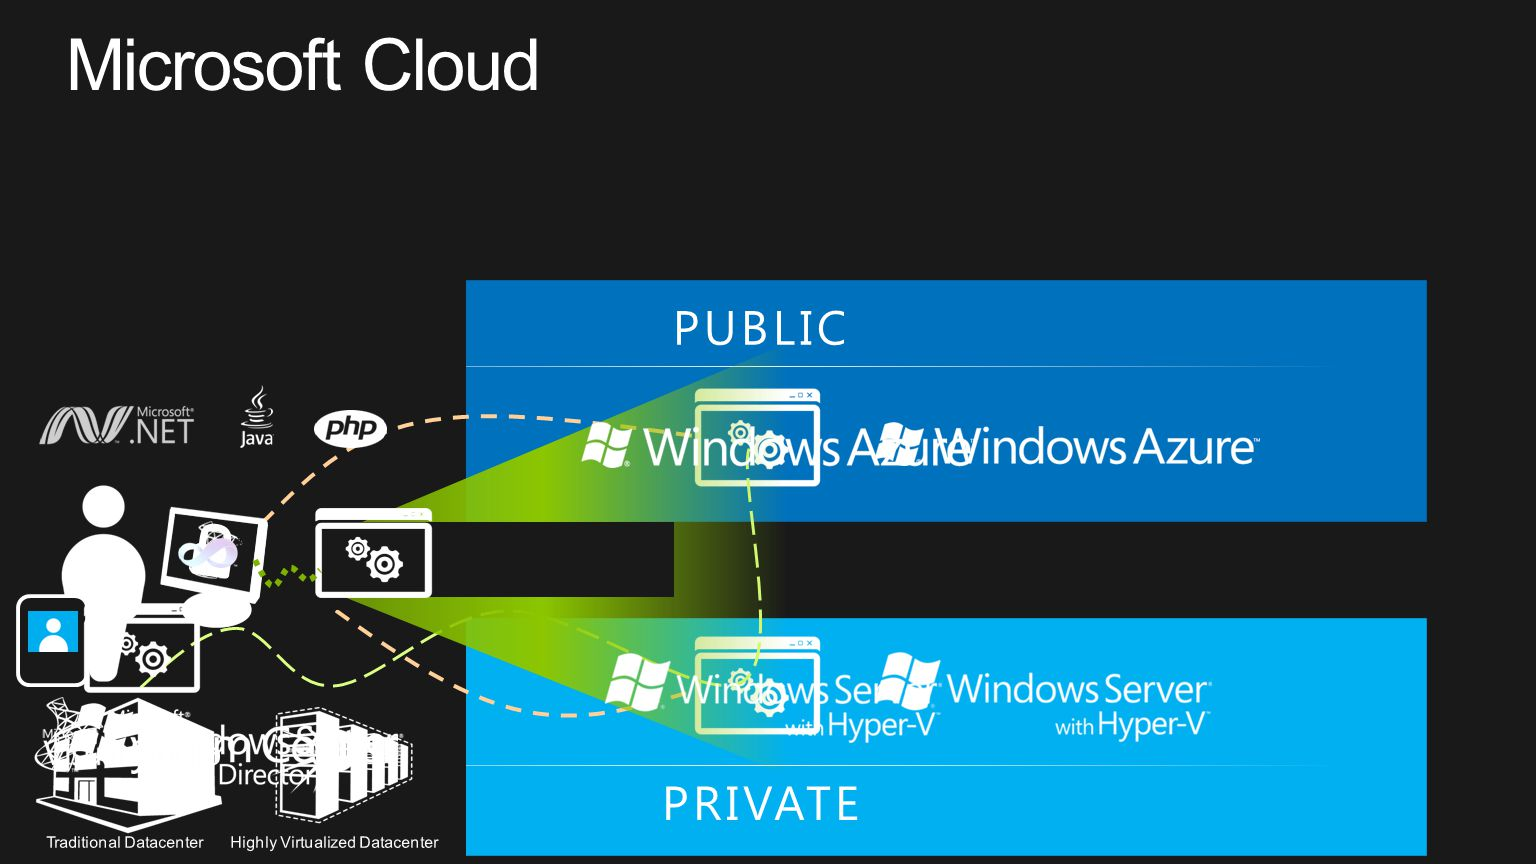 Development Management Virtualization PRIVATE PUBLIC Identity Traditional Datacenter Highly Virtualized Datacenter